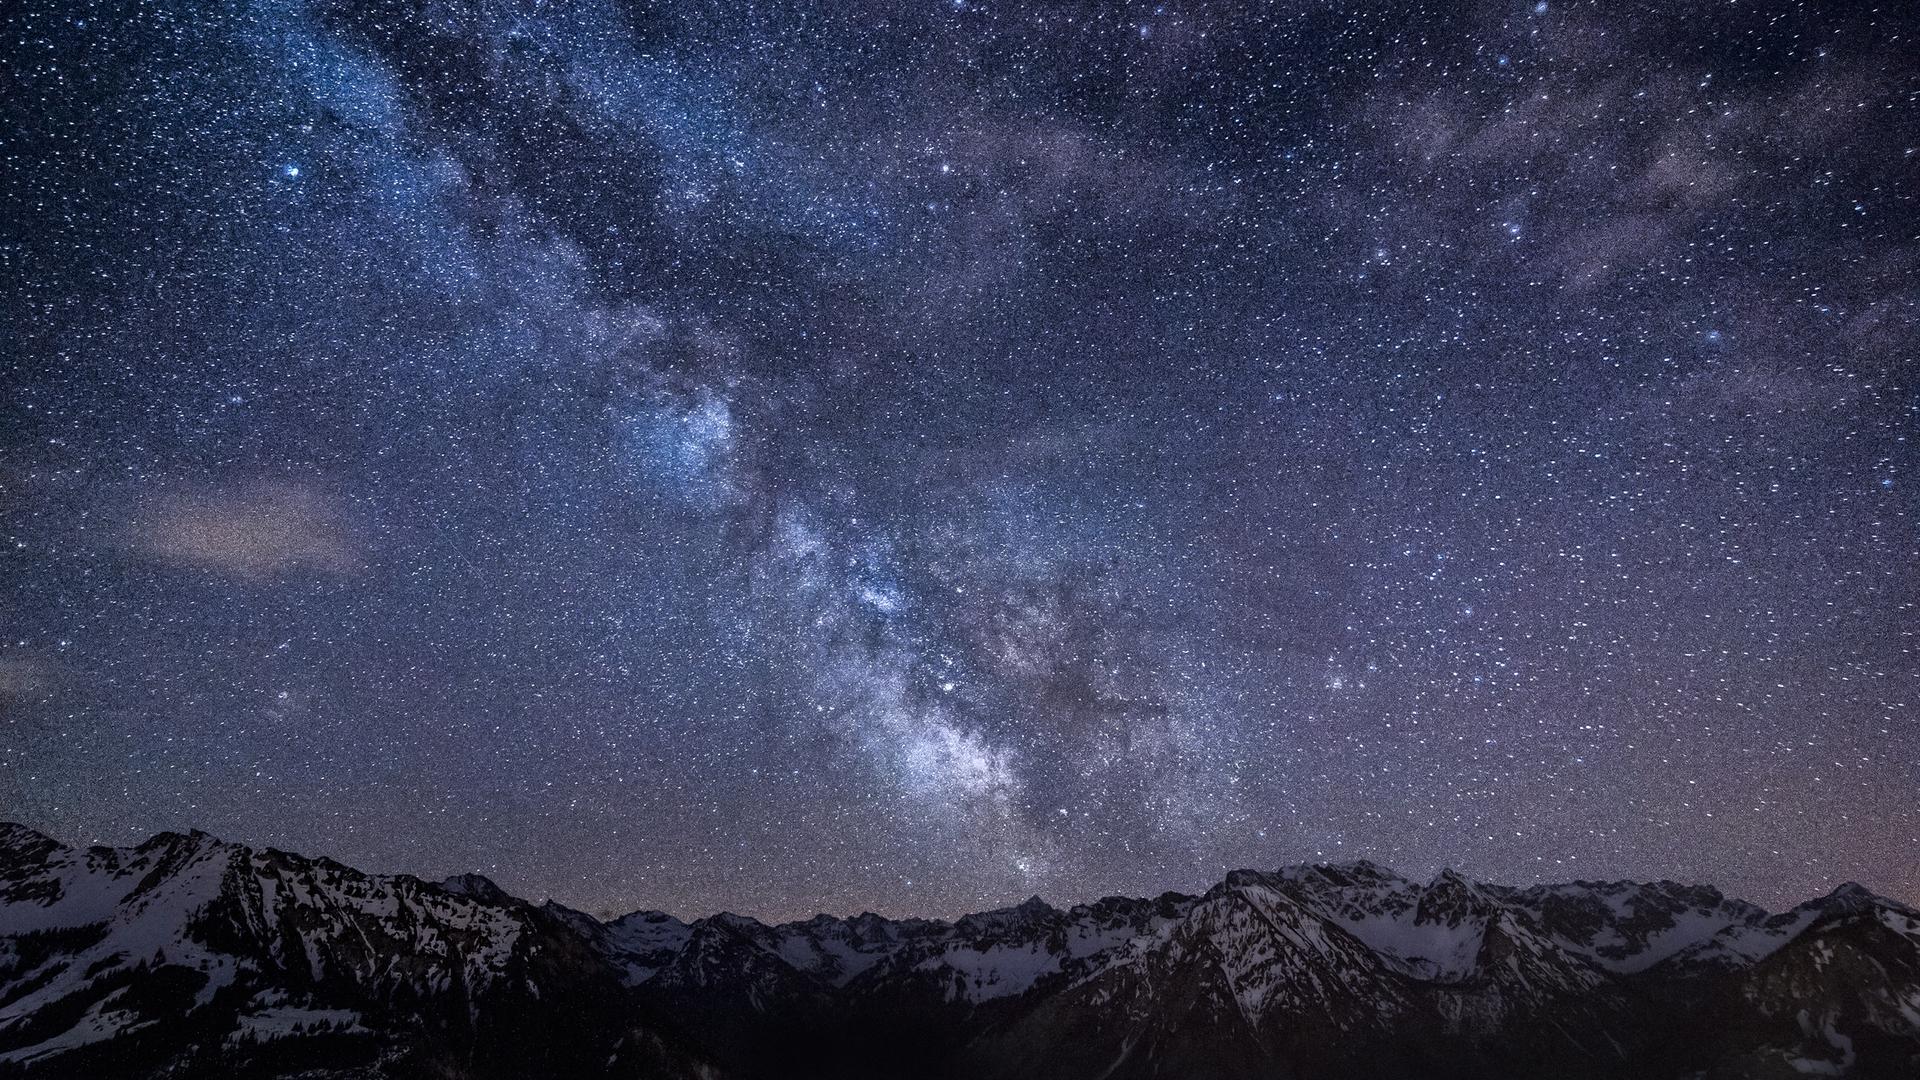 beautiful-night-sky-photography-3840x2160.jpg